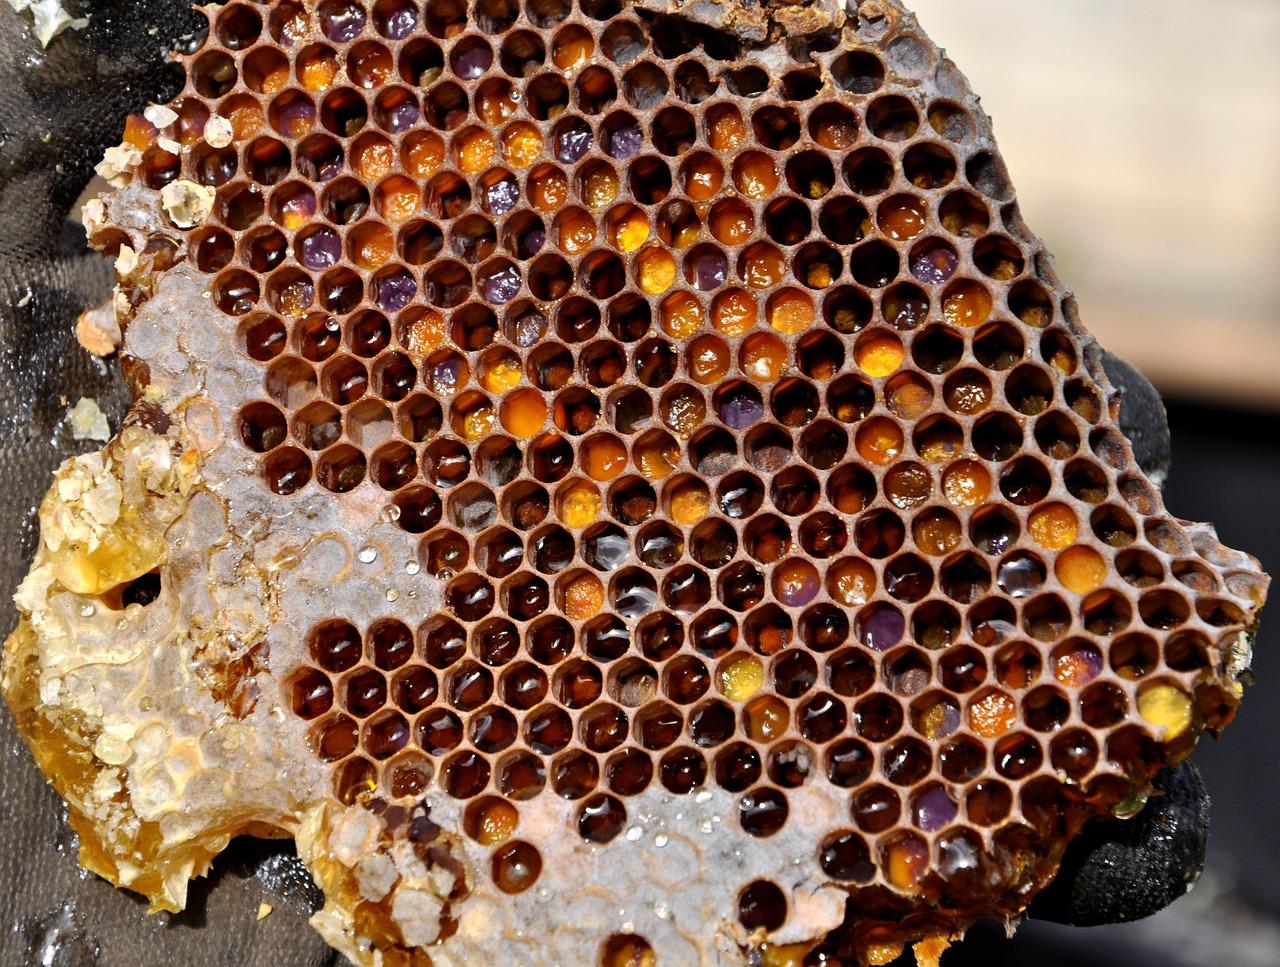 jelly bush honey australia 2